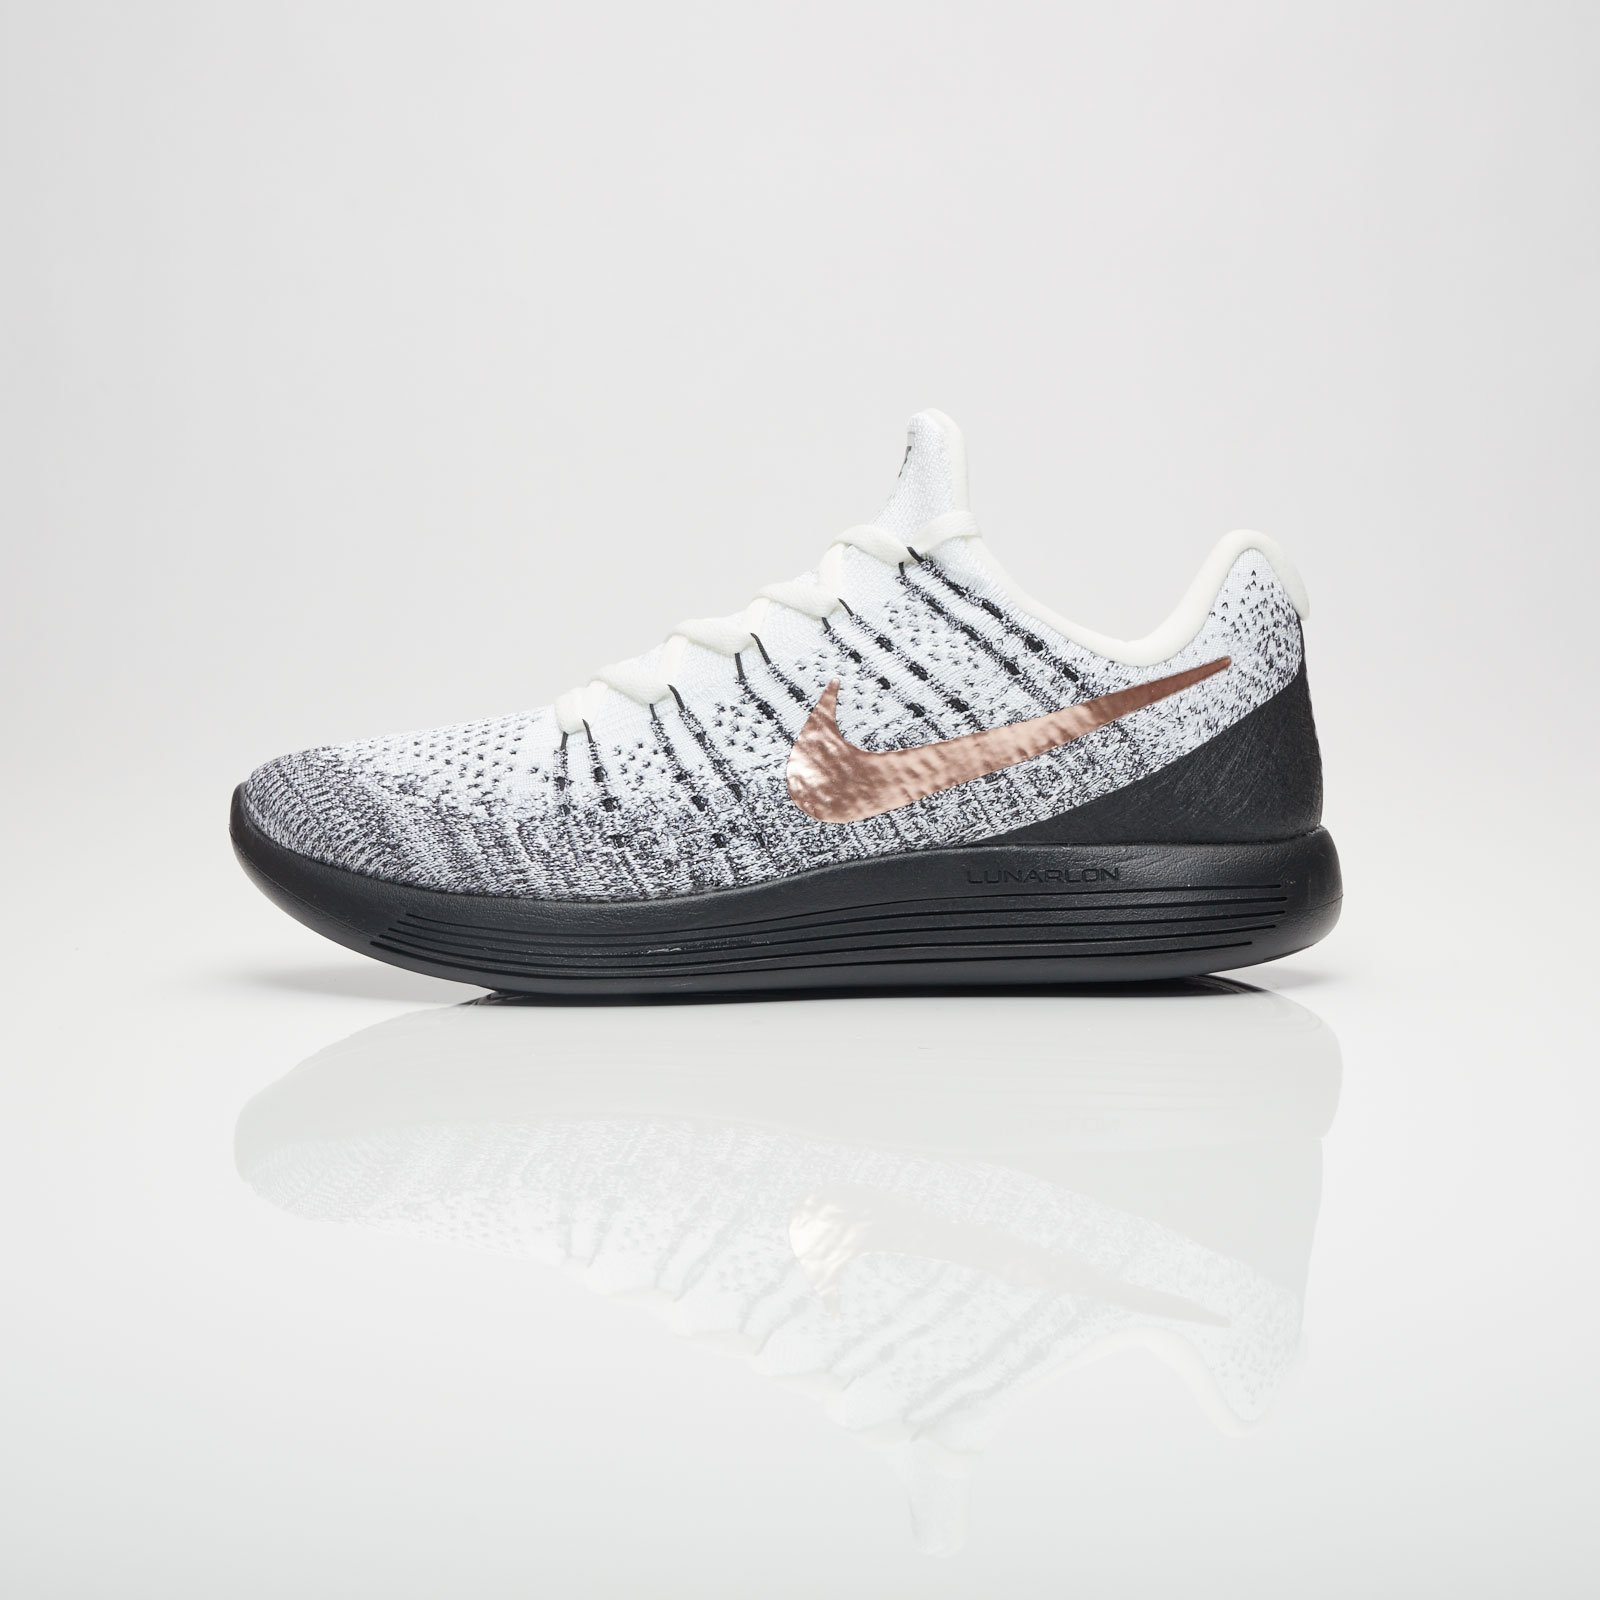 61212941a309 Nike Lunarepic Low FK 2 X-Plore - 904742-100 - Sneakersnstuff ...